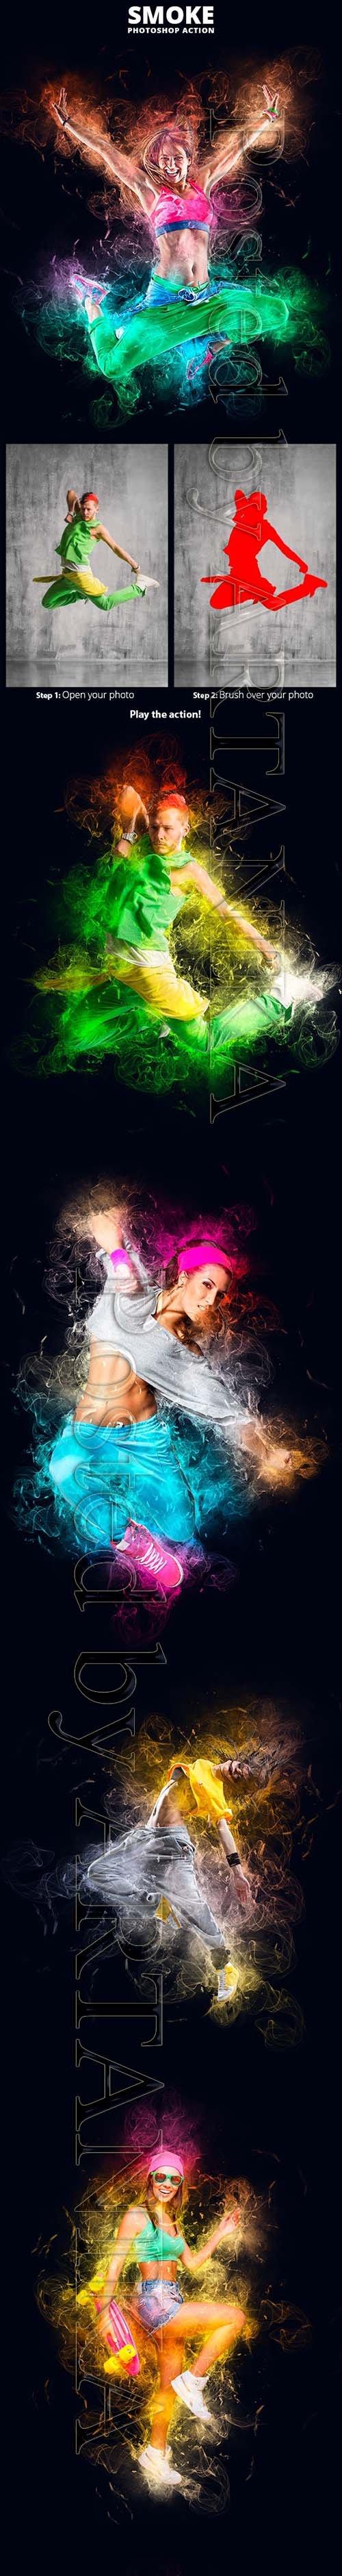 Smoke Photoshop Action 23387176